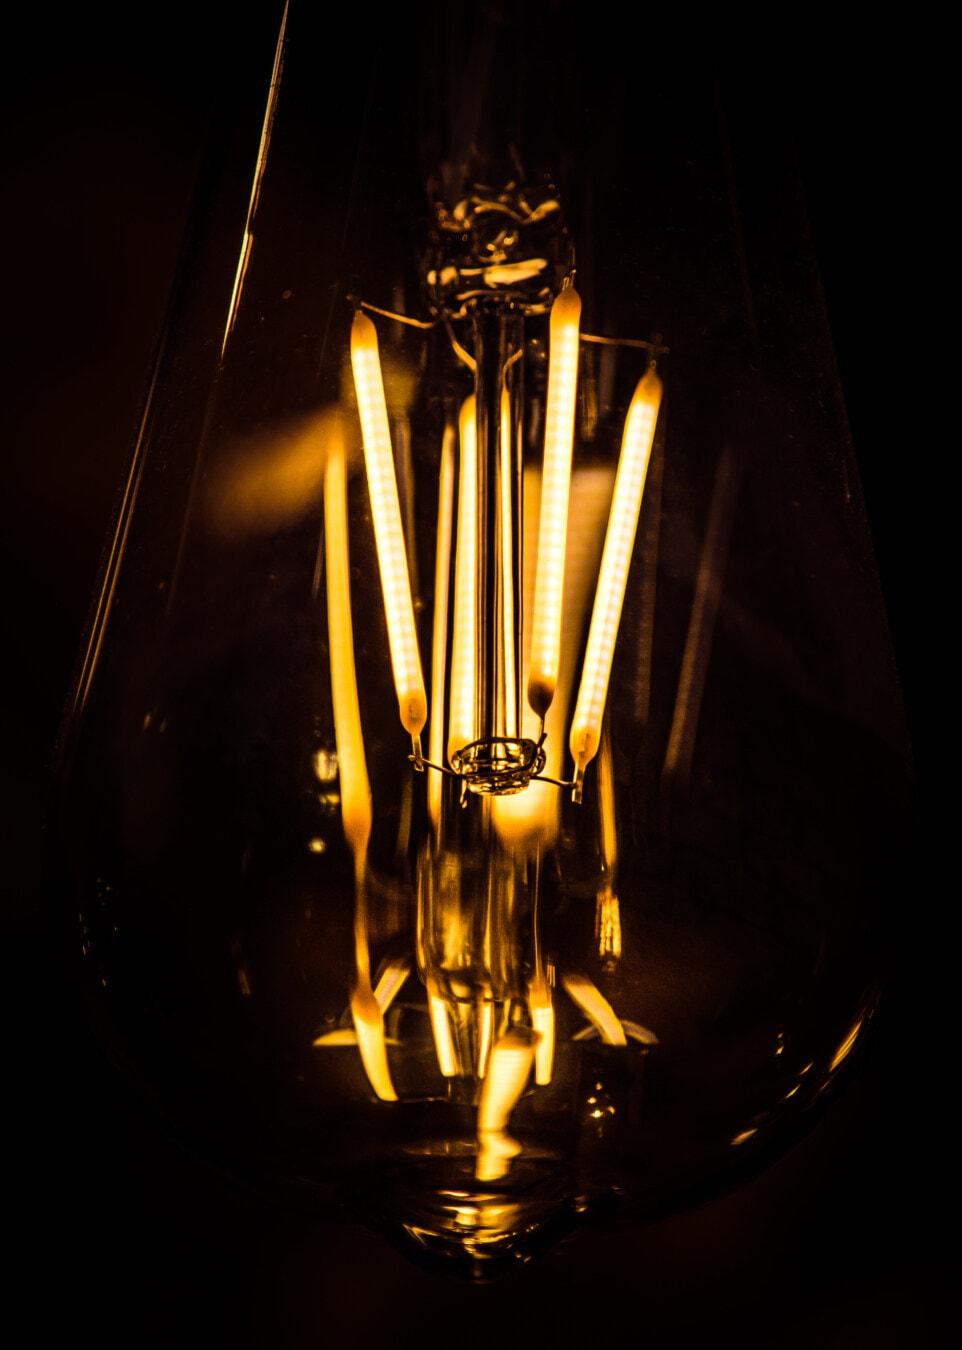 filament, wire, close-up, light, light bulb, bright, bulb, dark, energy, electricity